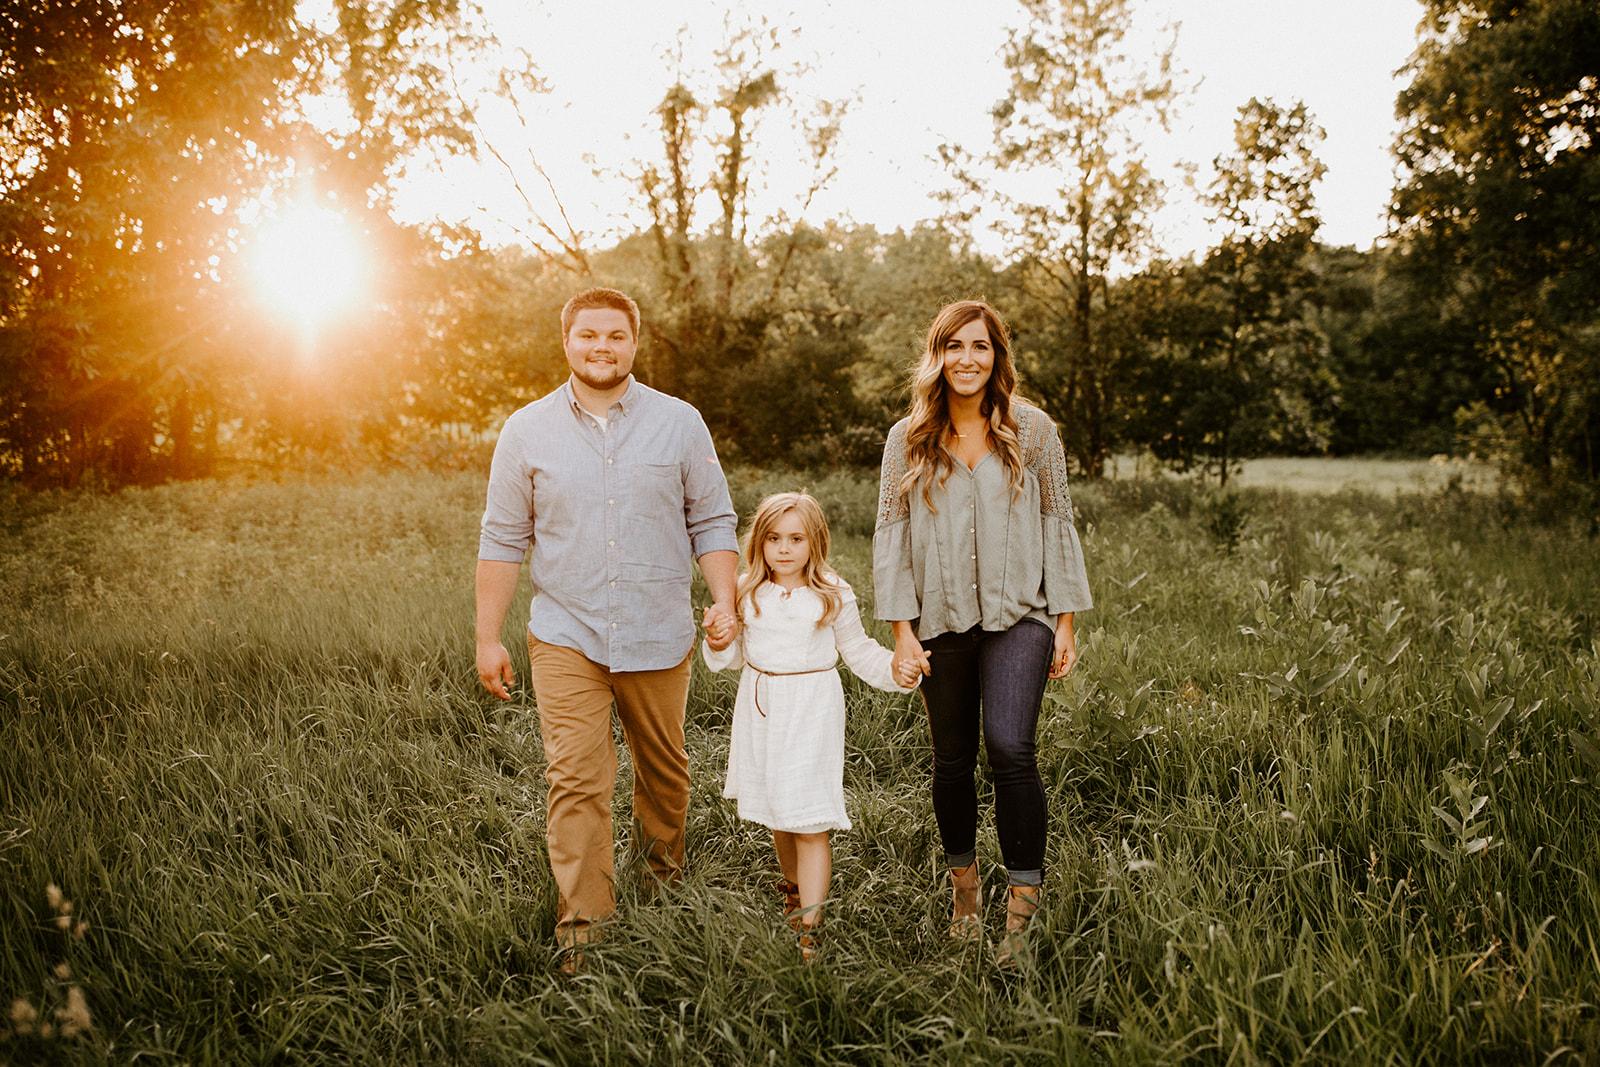 Musser_Family_Session_Illinois_Ellie_Cole-148.jpg